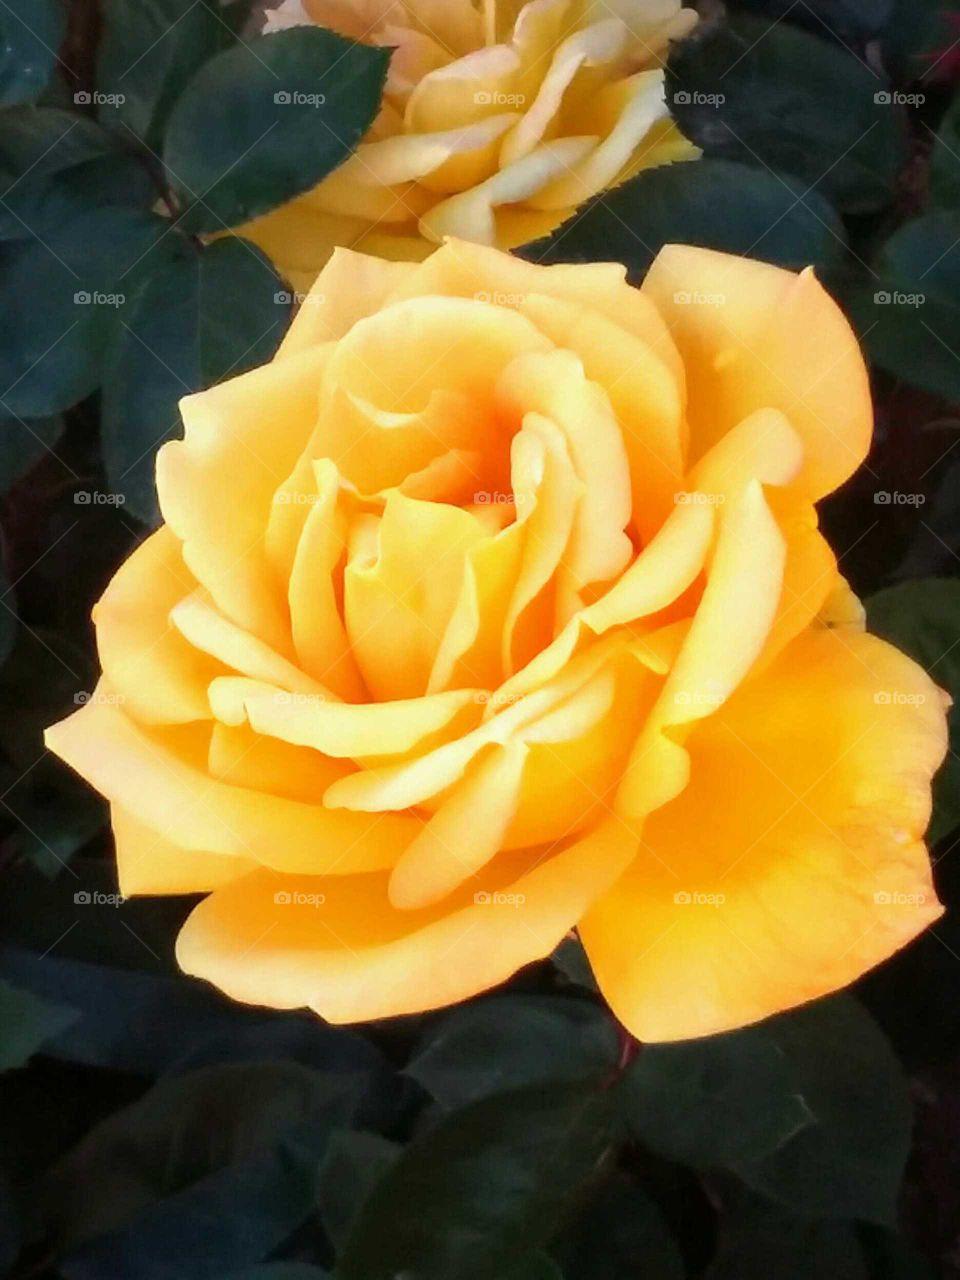 Yellow Rose =Friendship